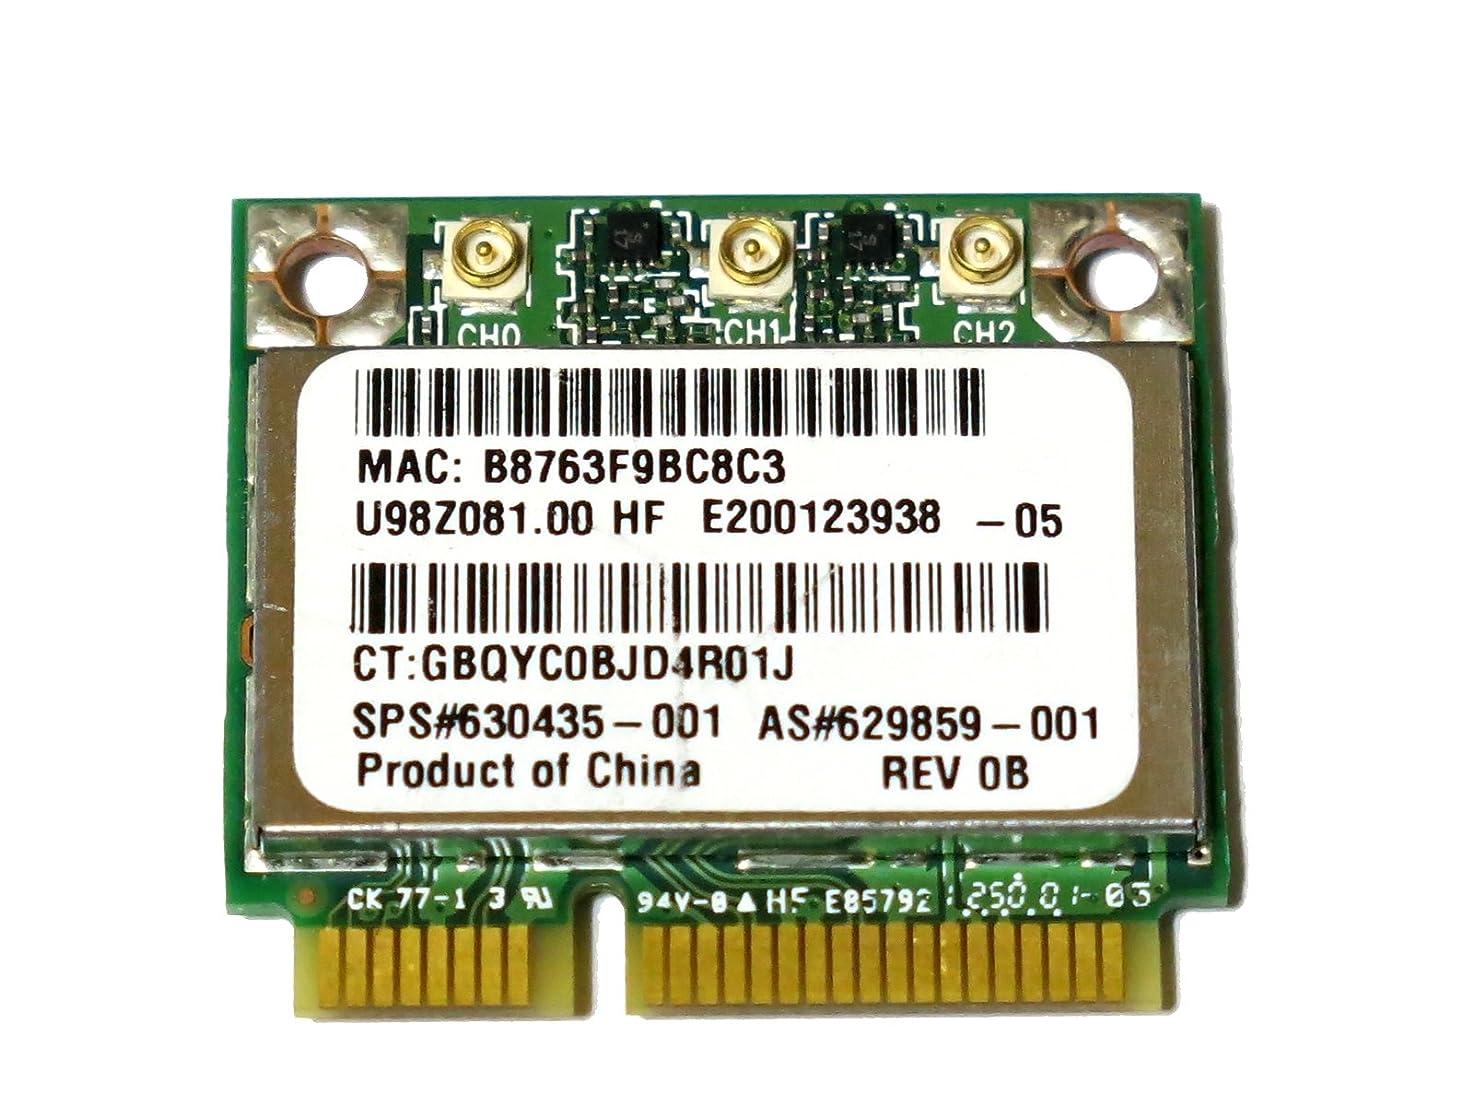 HP純正+汎用 Atheros AR5BHB112(AR9380) 450Mbps 3T3R 802.11a/b/g/n 無線LANカード 630435-001